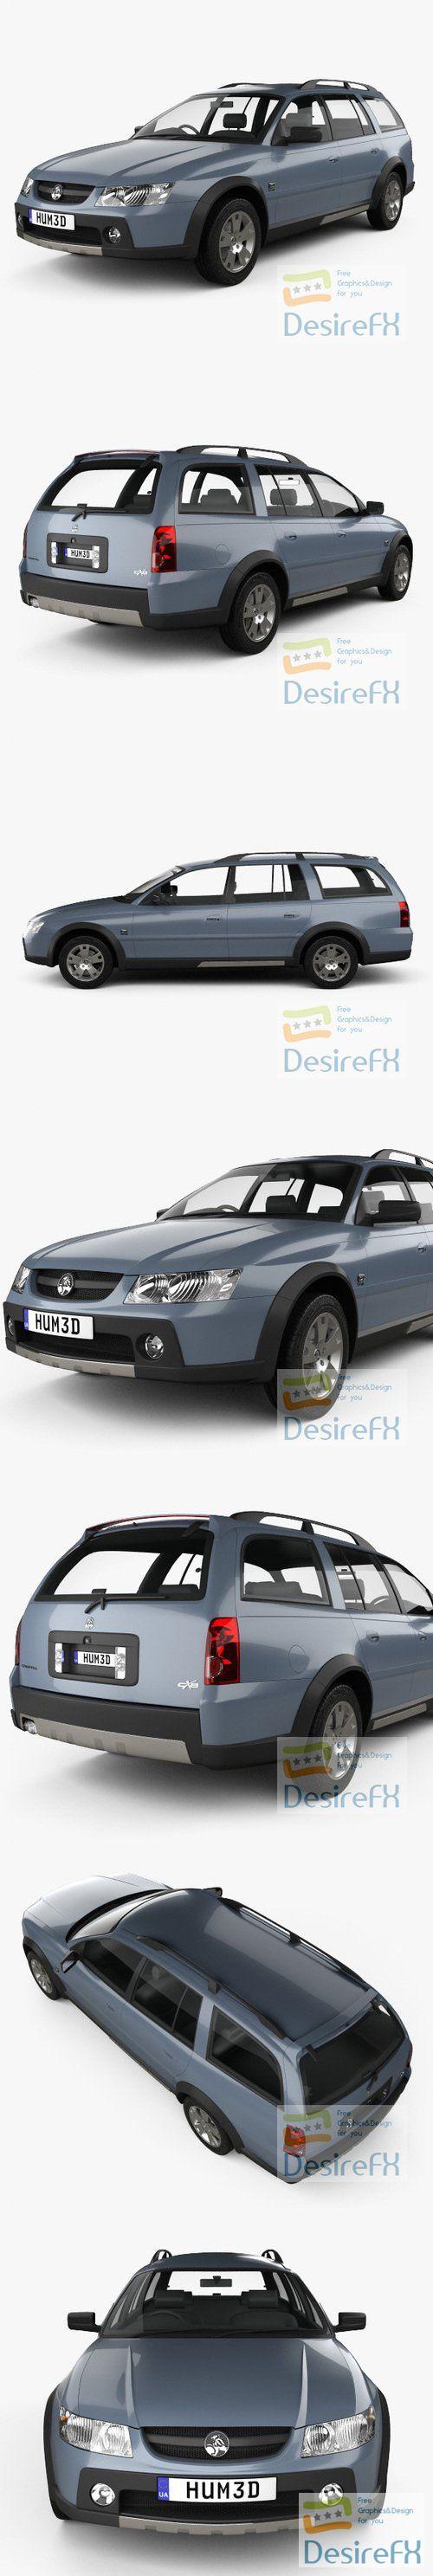 Holden Adventra LX6 2005 3D Model